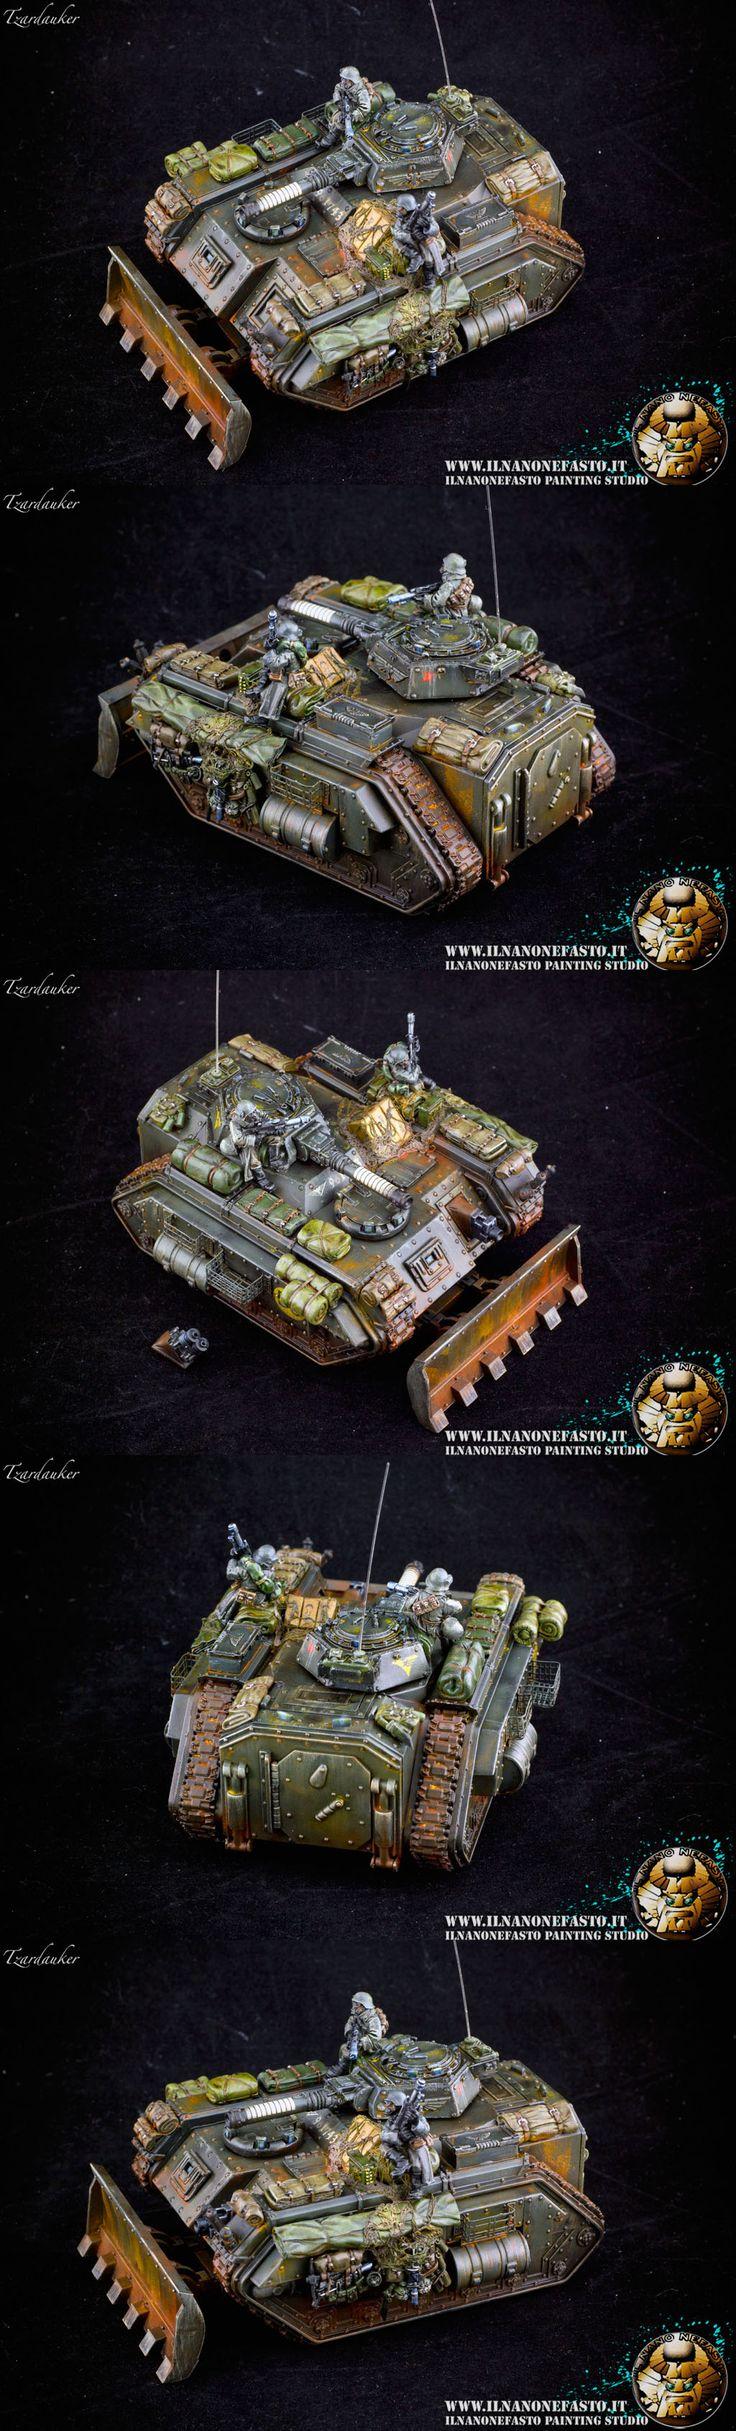 Imperial Guard Chimera Autocannon turret converted